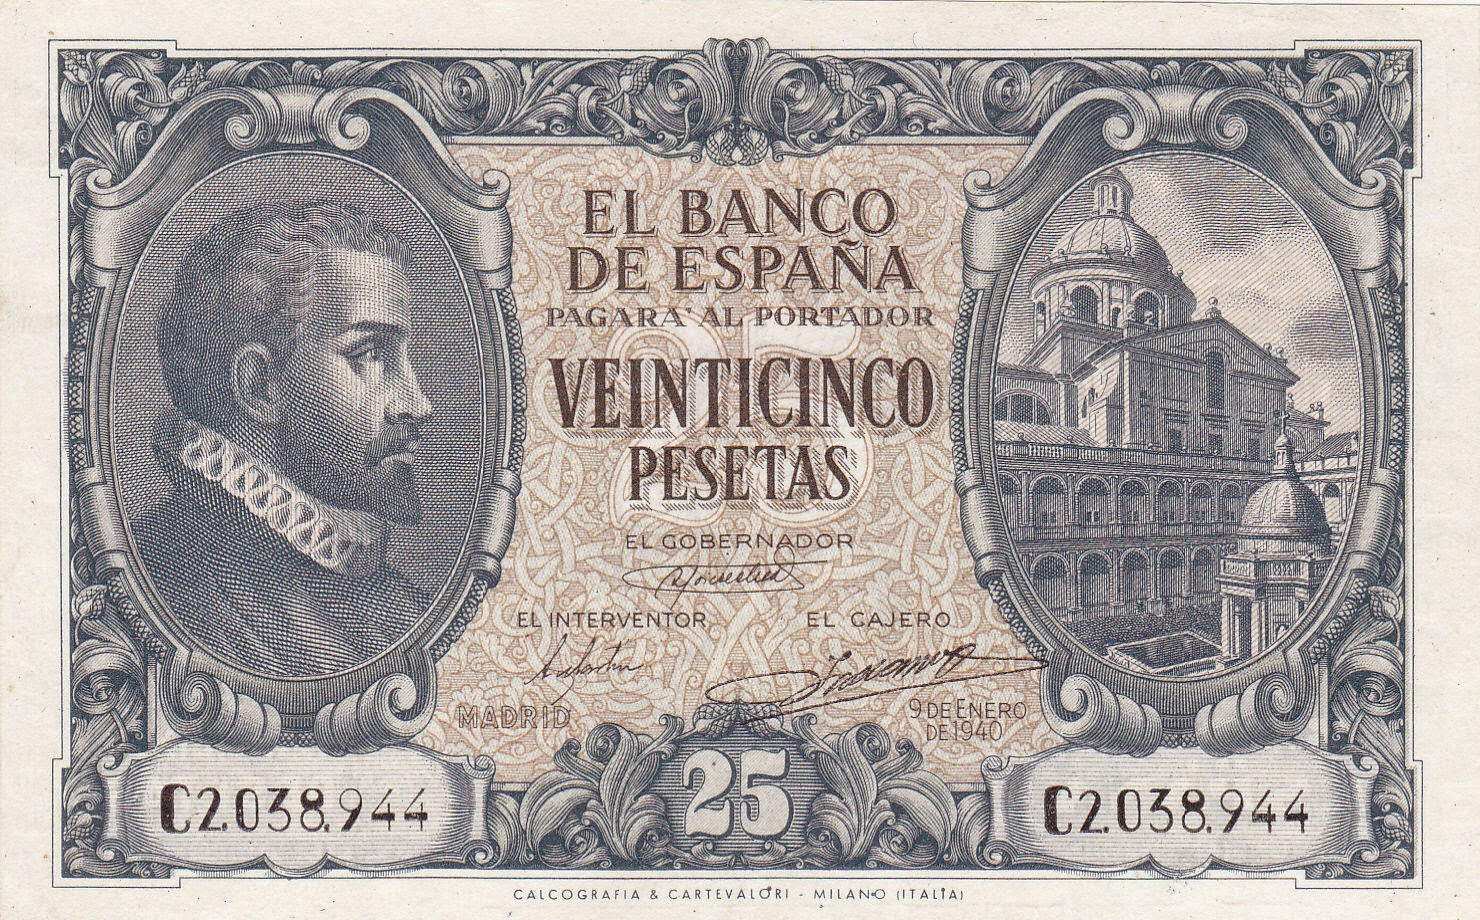 Spain Banknotes 25 Pesetas banknote 1940 Juan de Herrera and view of the Courtyard of the Evangelists of the Monastery of San Lorenzo de El Escorial